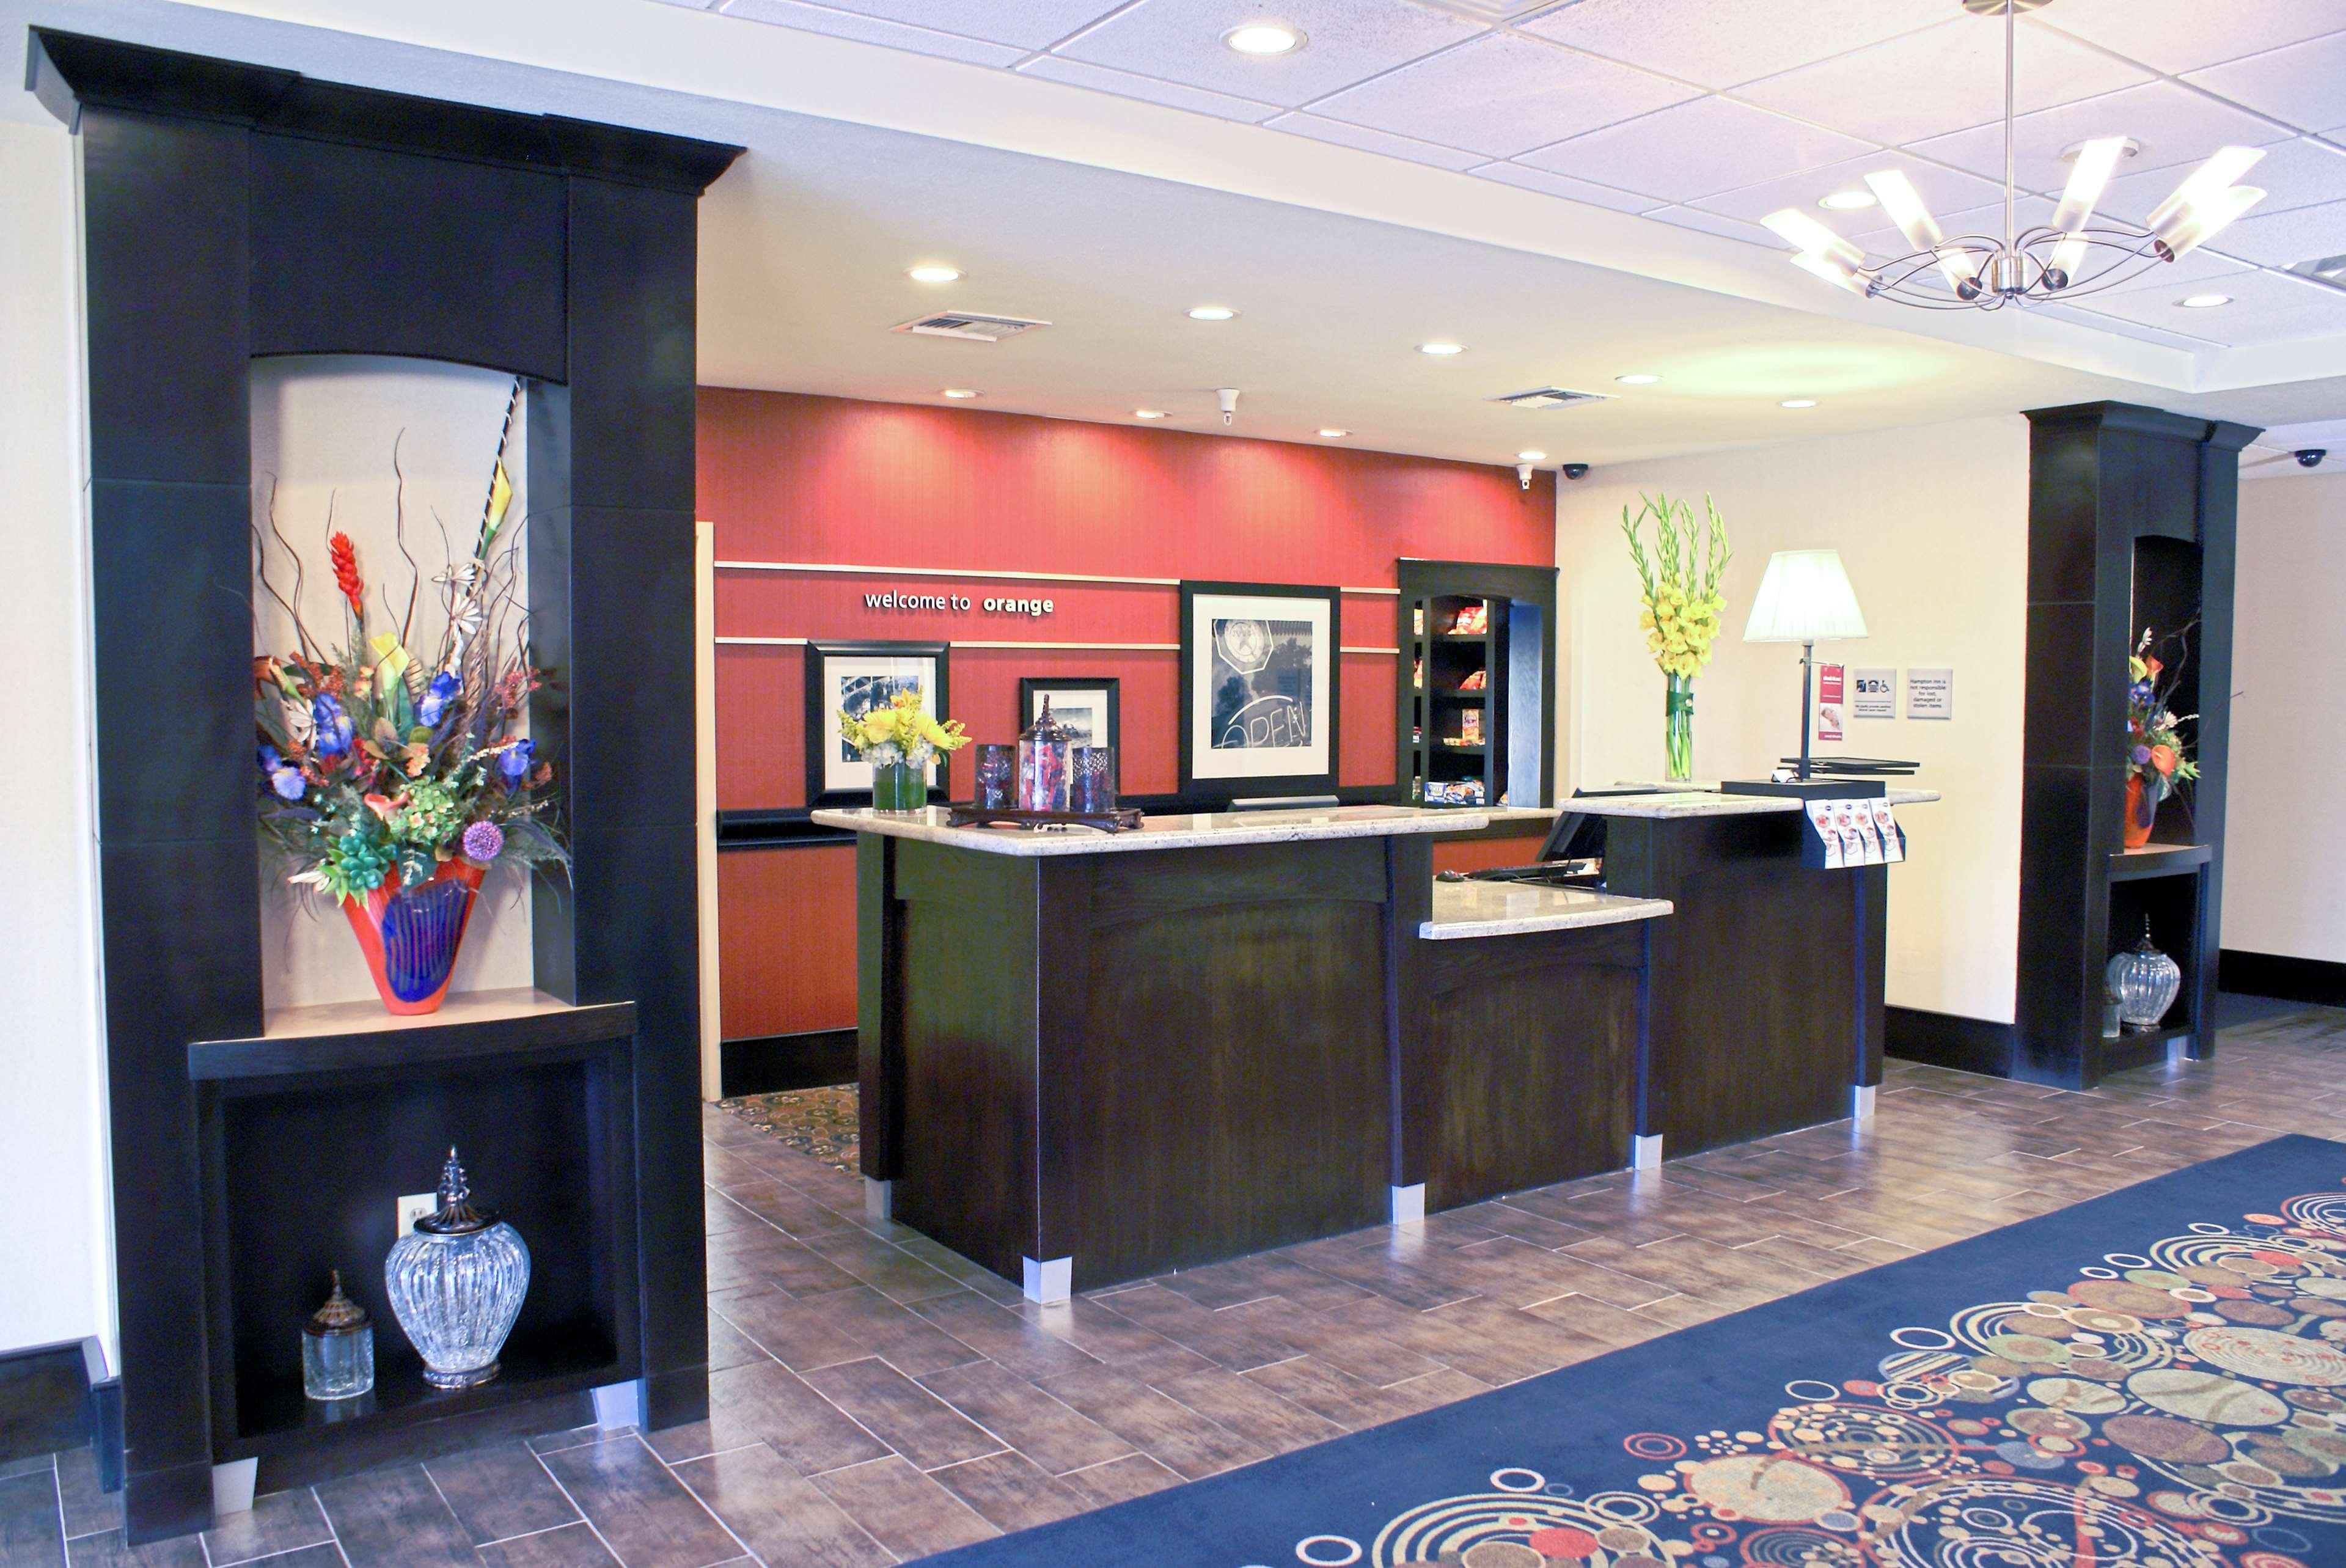 Hampton Inn Orange image 6